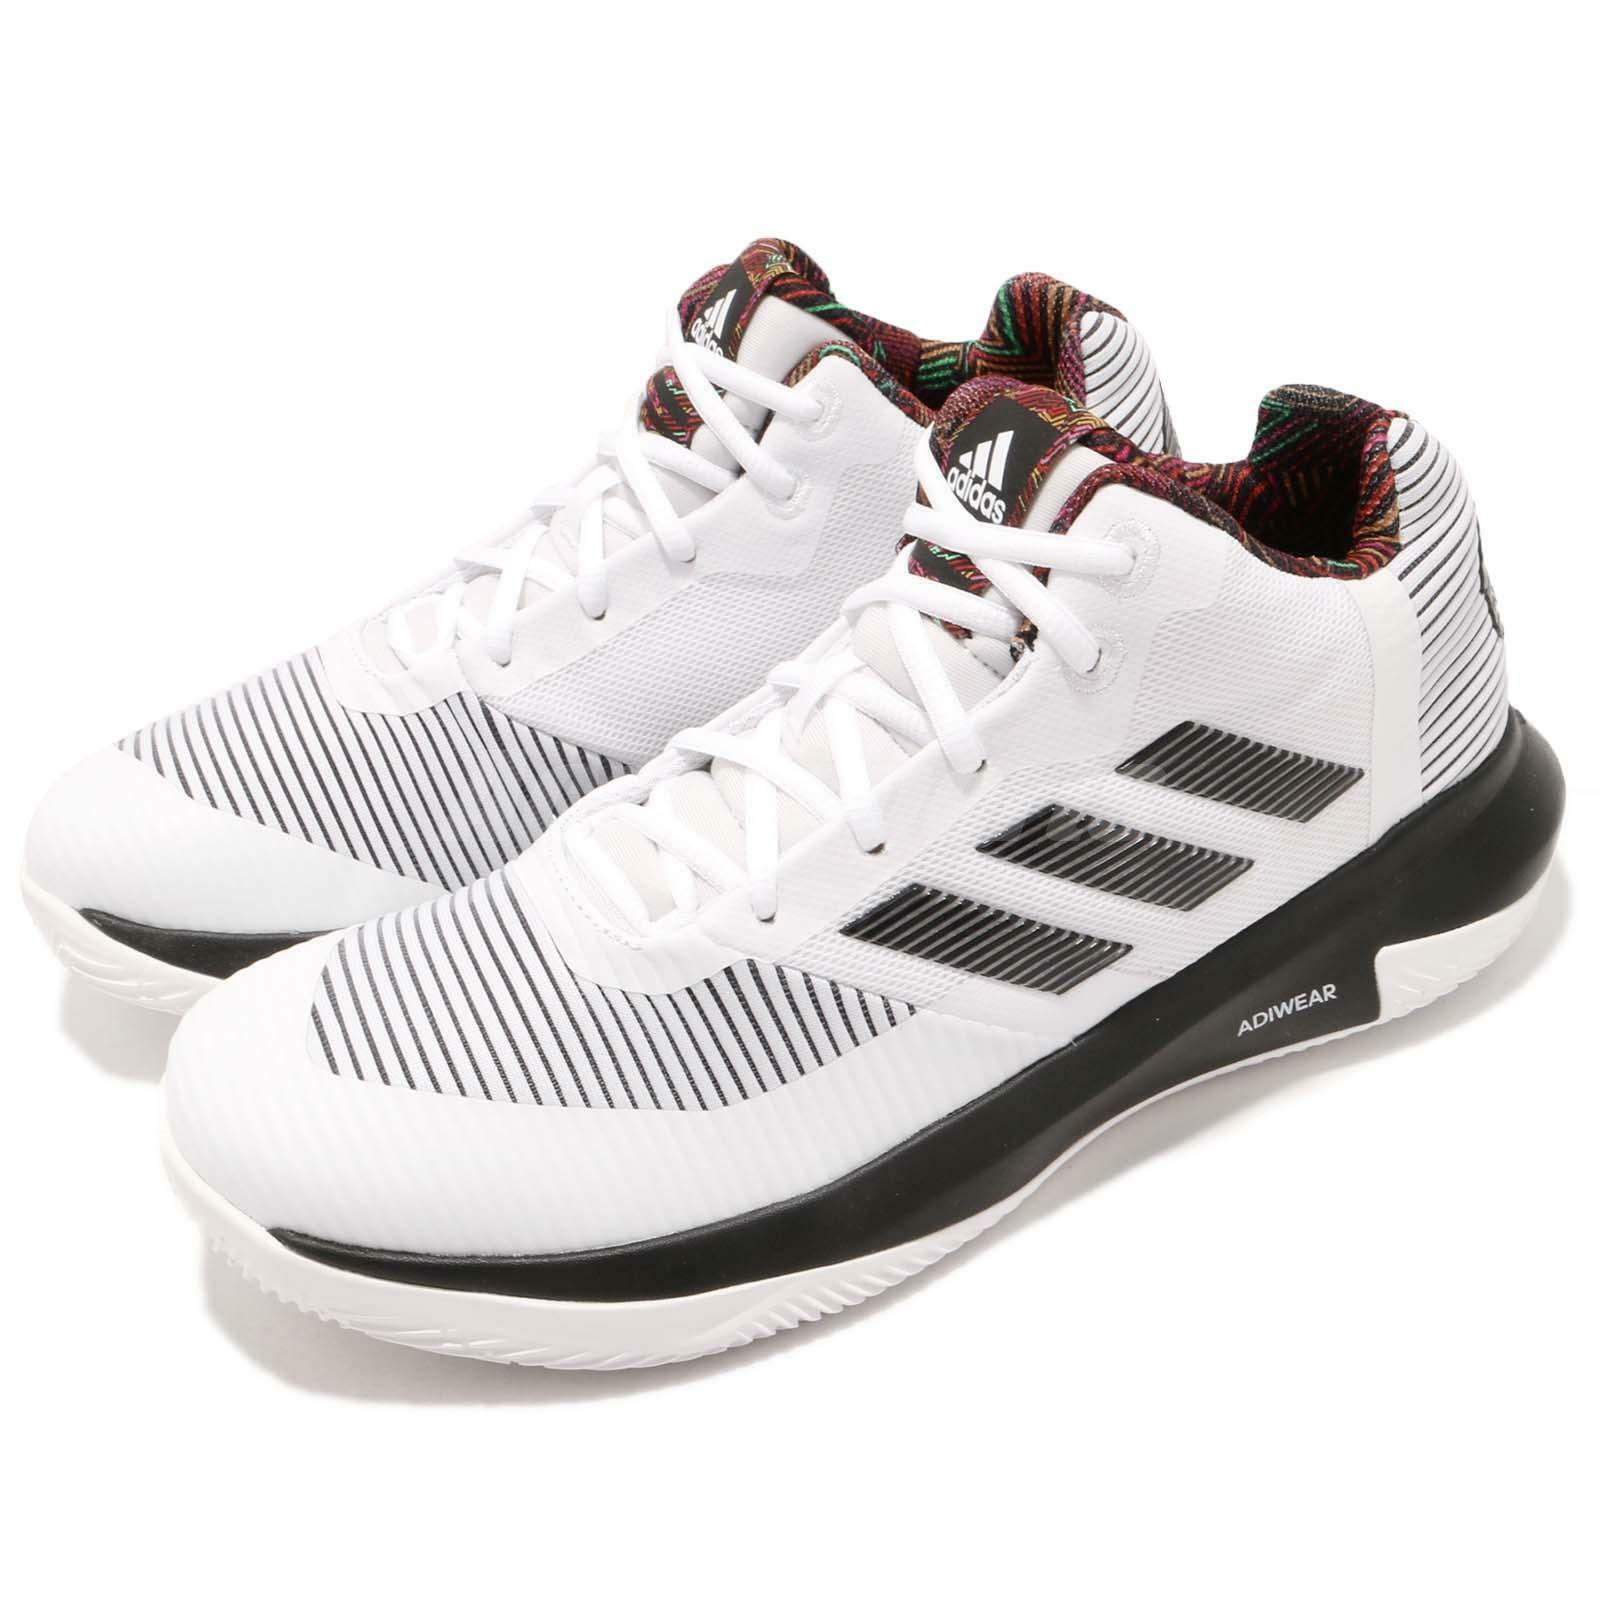 Adidas D D D rosa Lethality Derrick Summer Pack bianca nero Uomo scarpe scarpe da ginnastica BB7158 92c4be